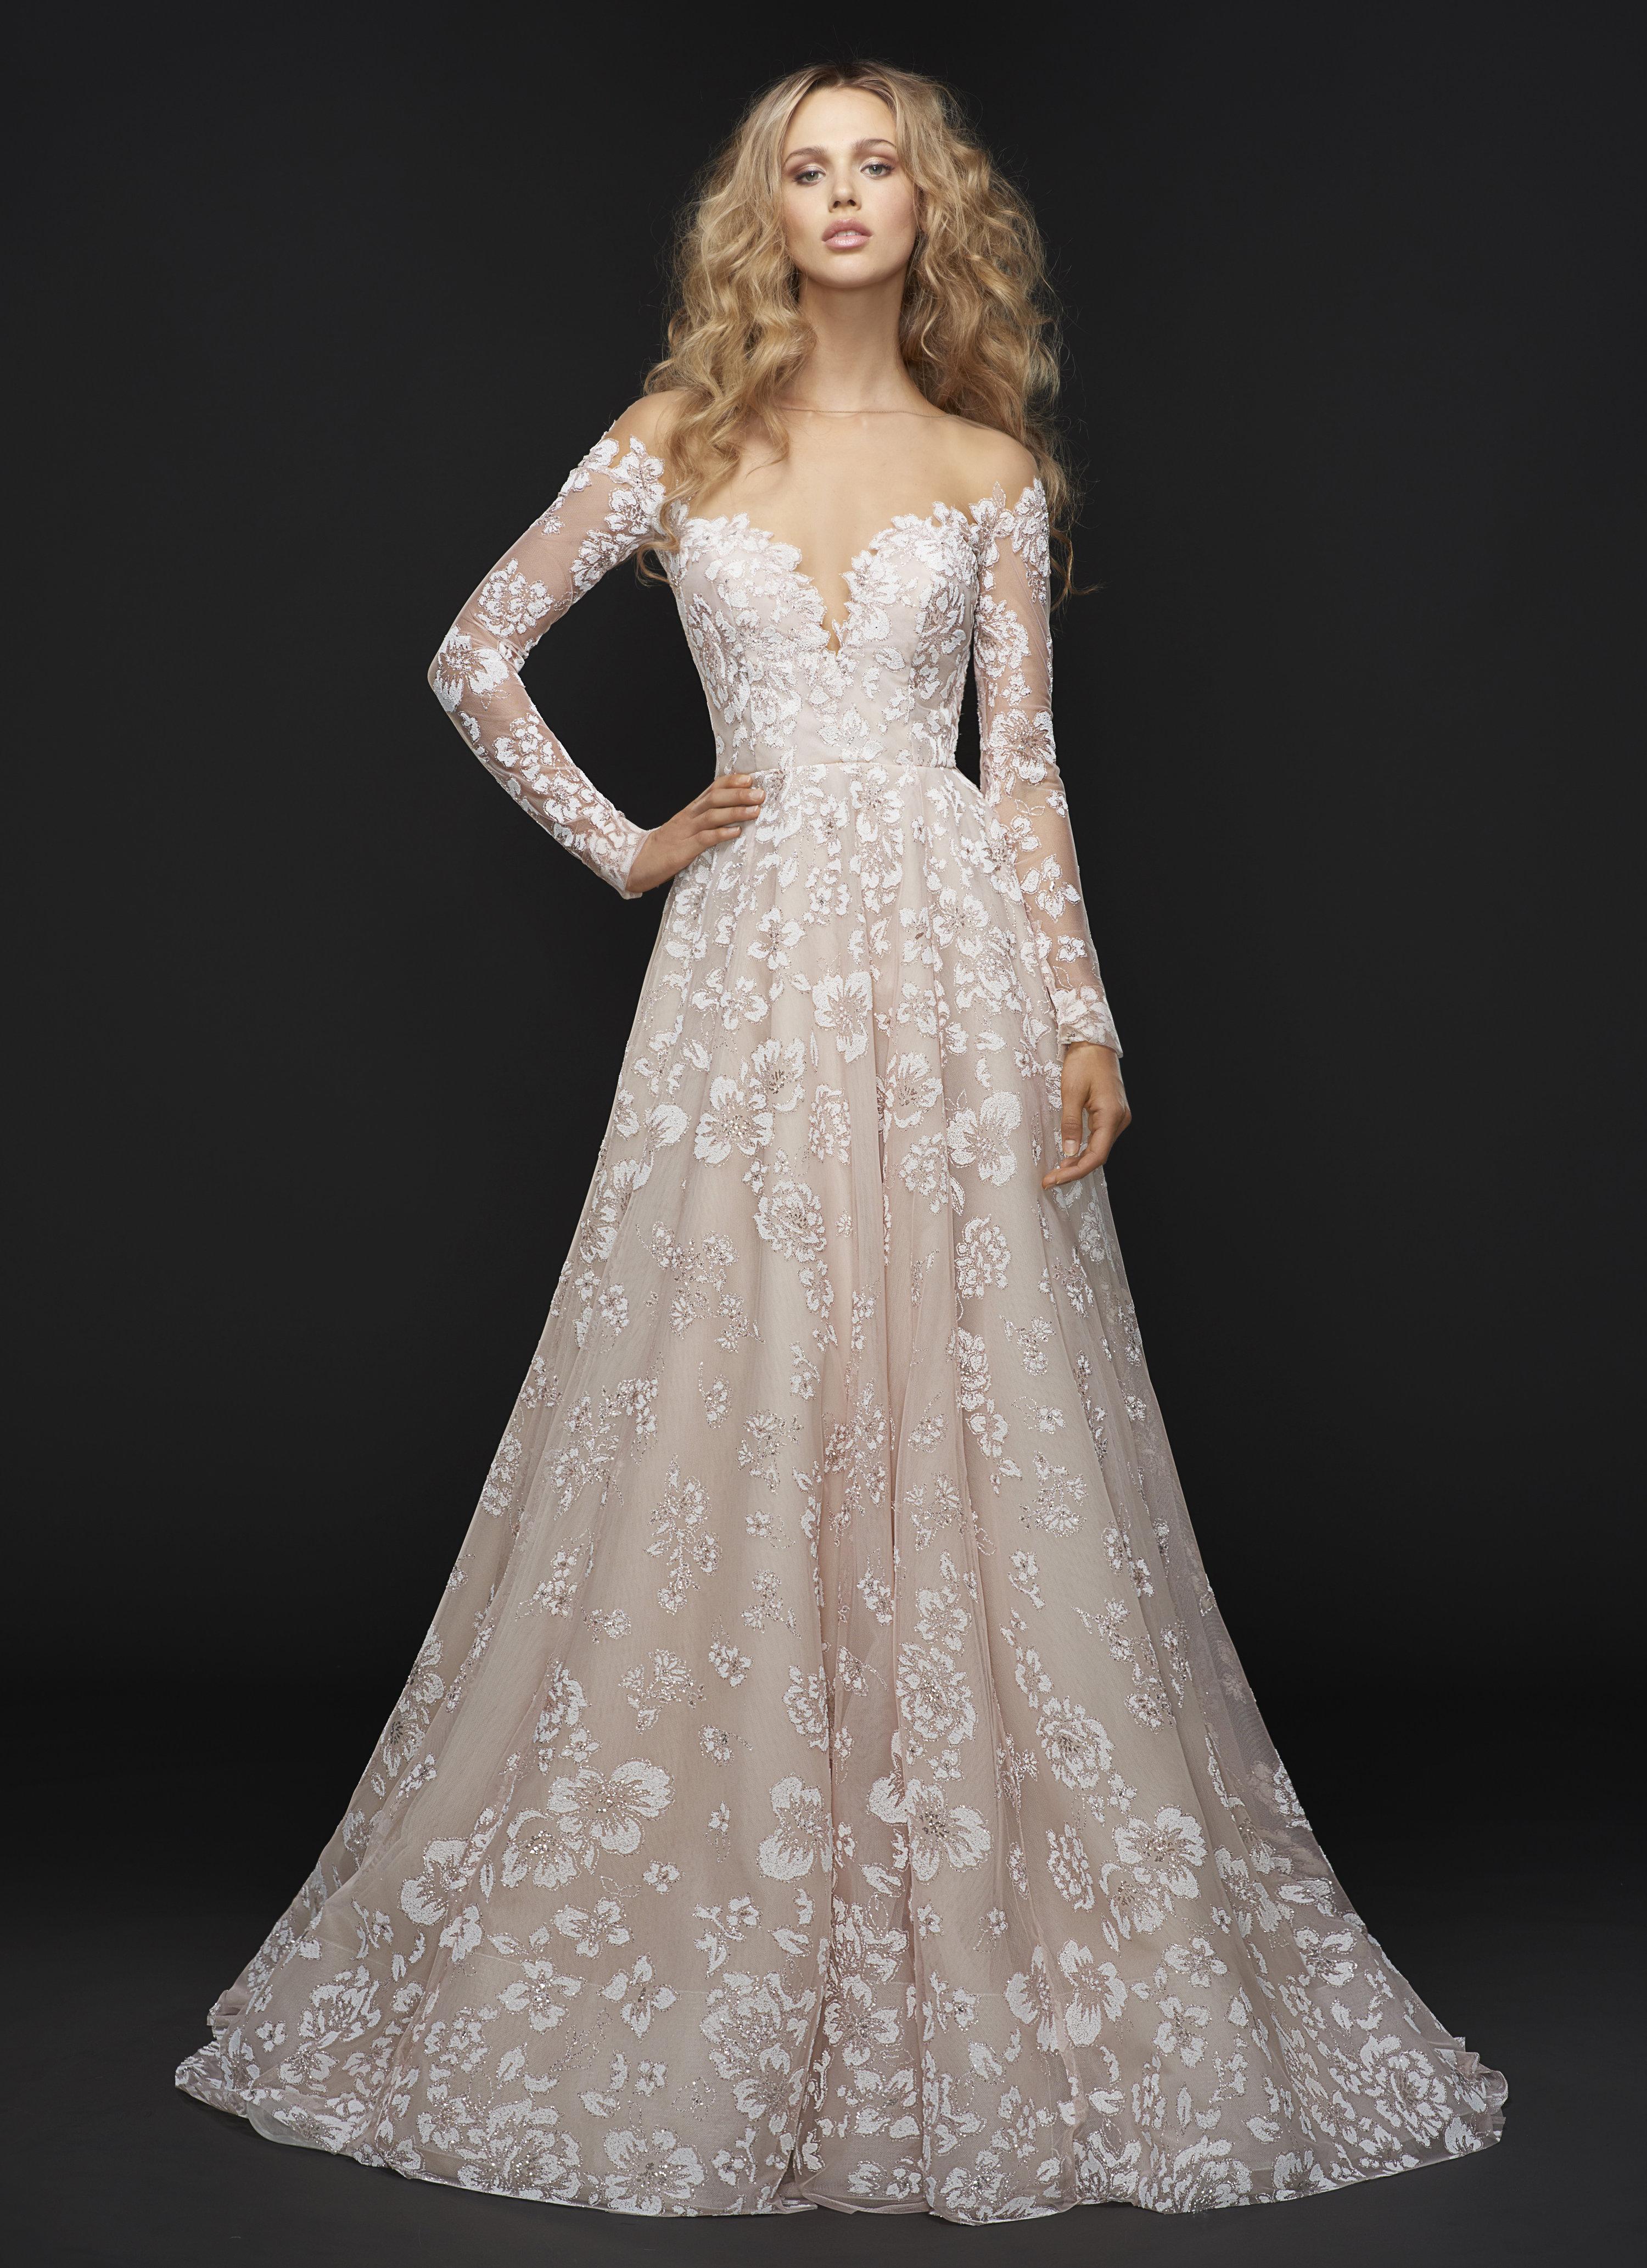 Wedding dresses nordstrom   SandiegoTowingca.com